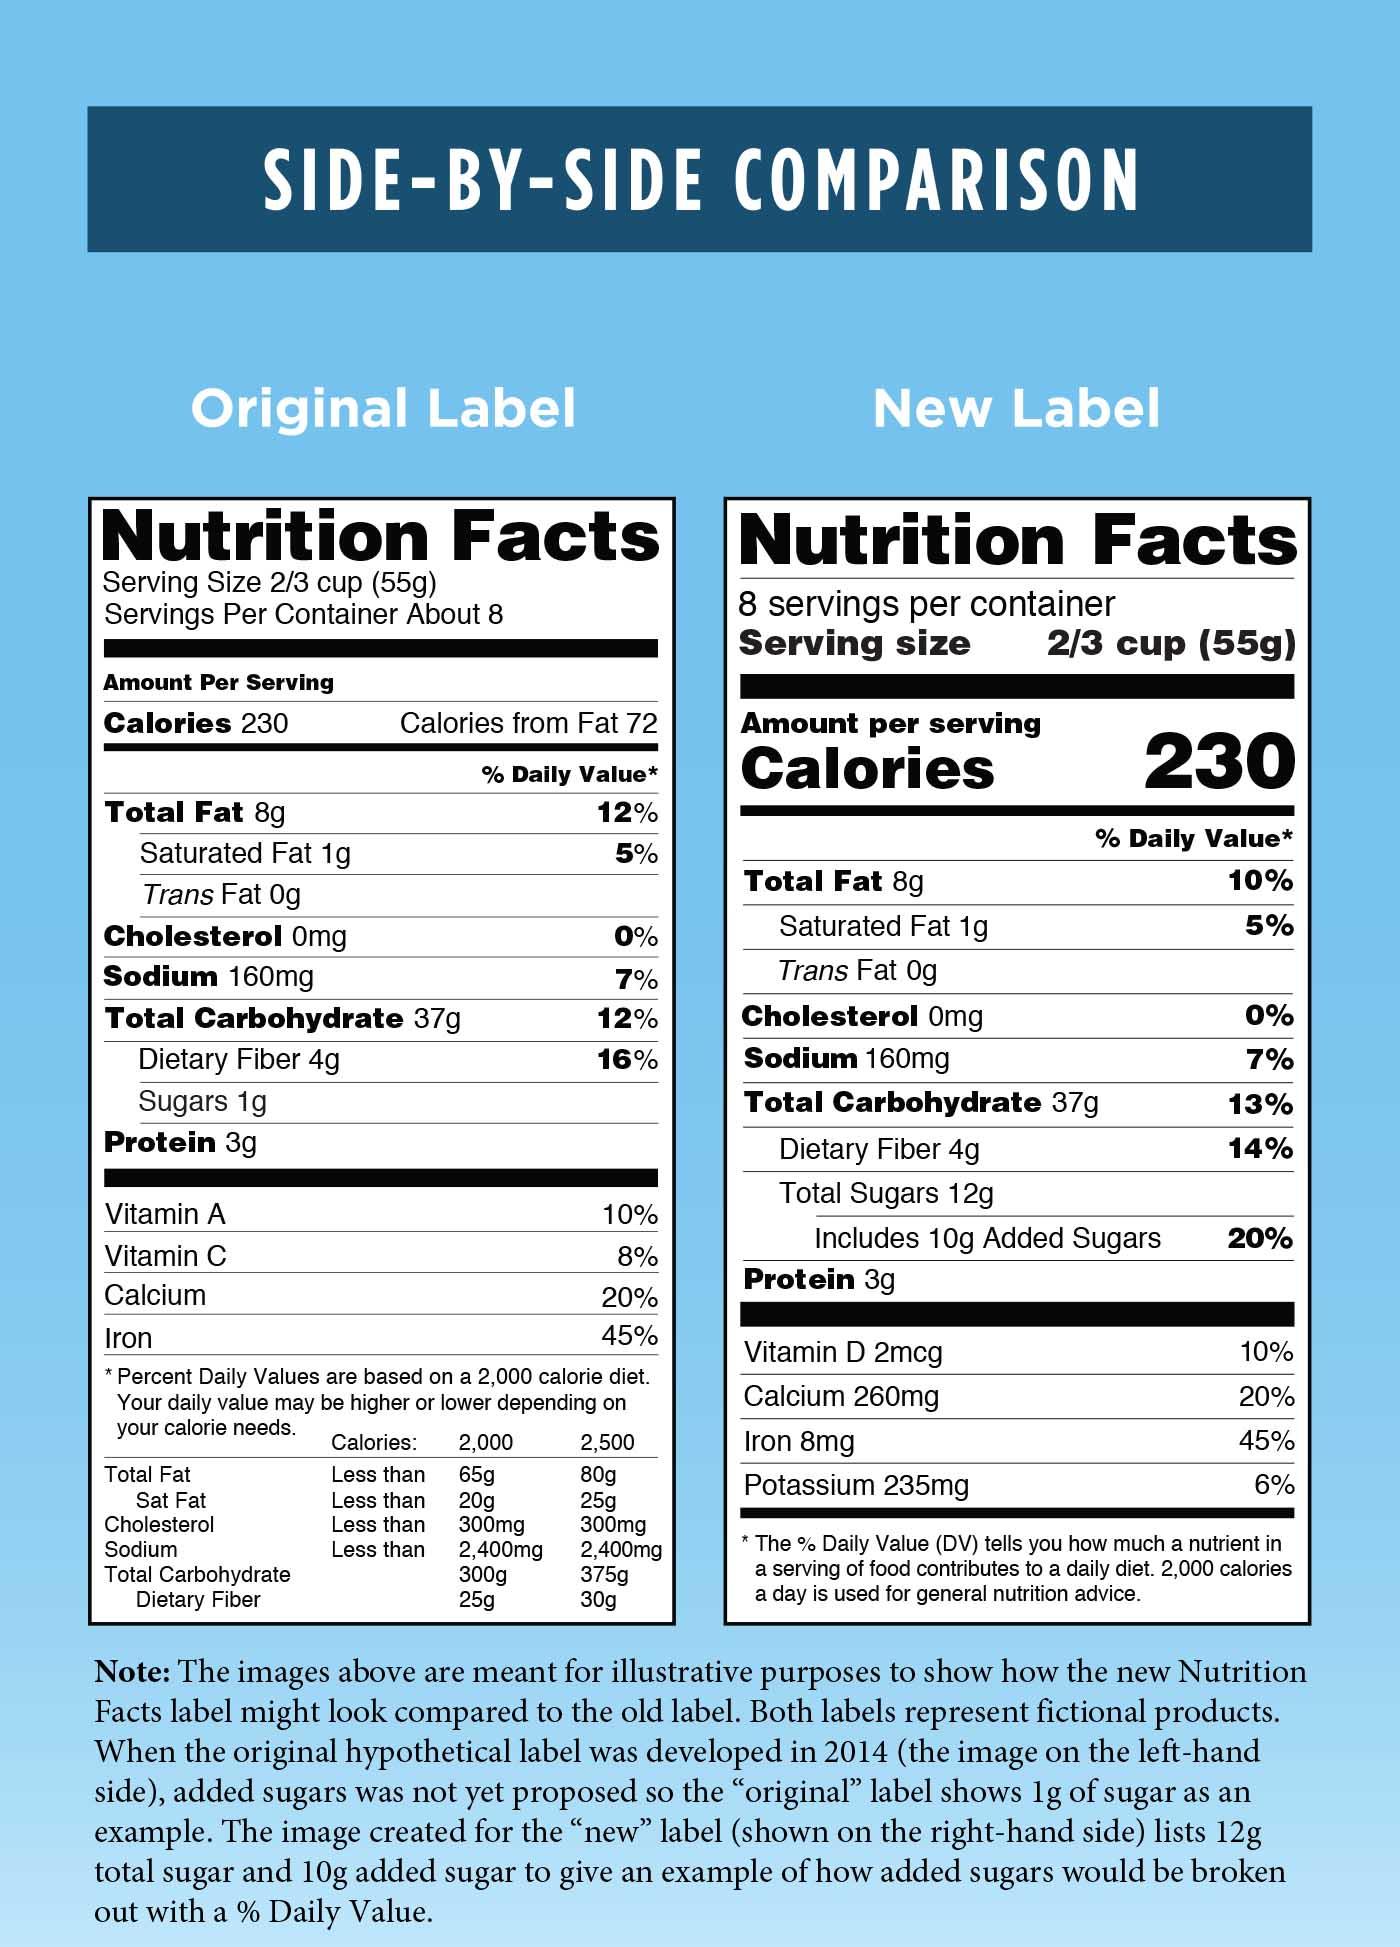 Original versus New Label - Side-by-Side Comparison